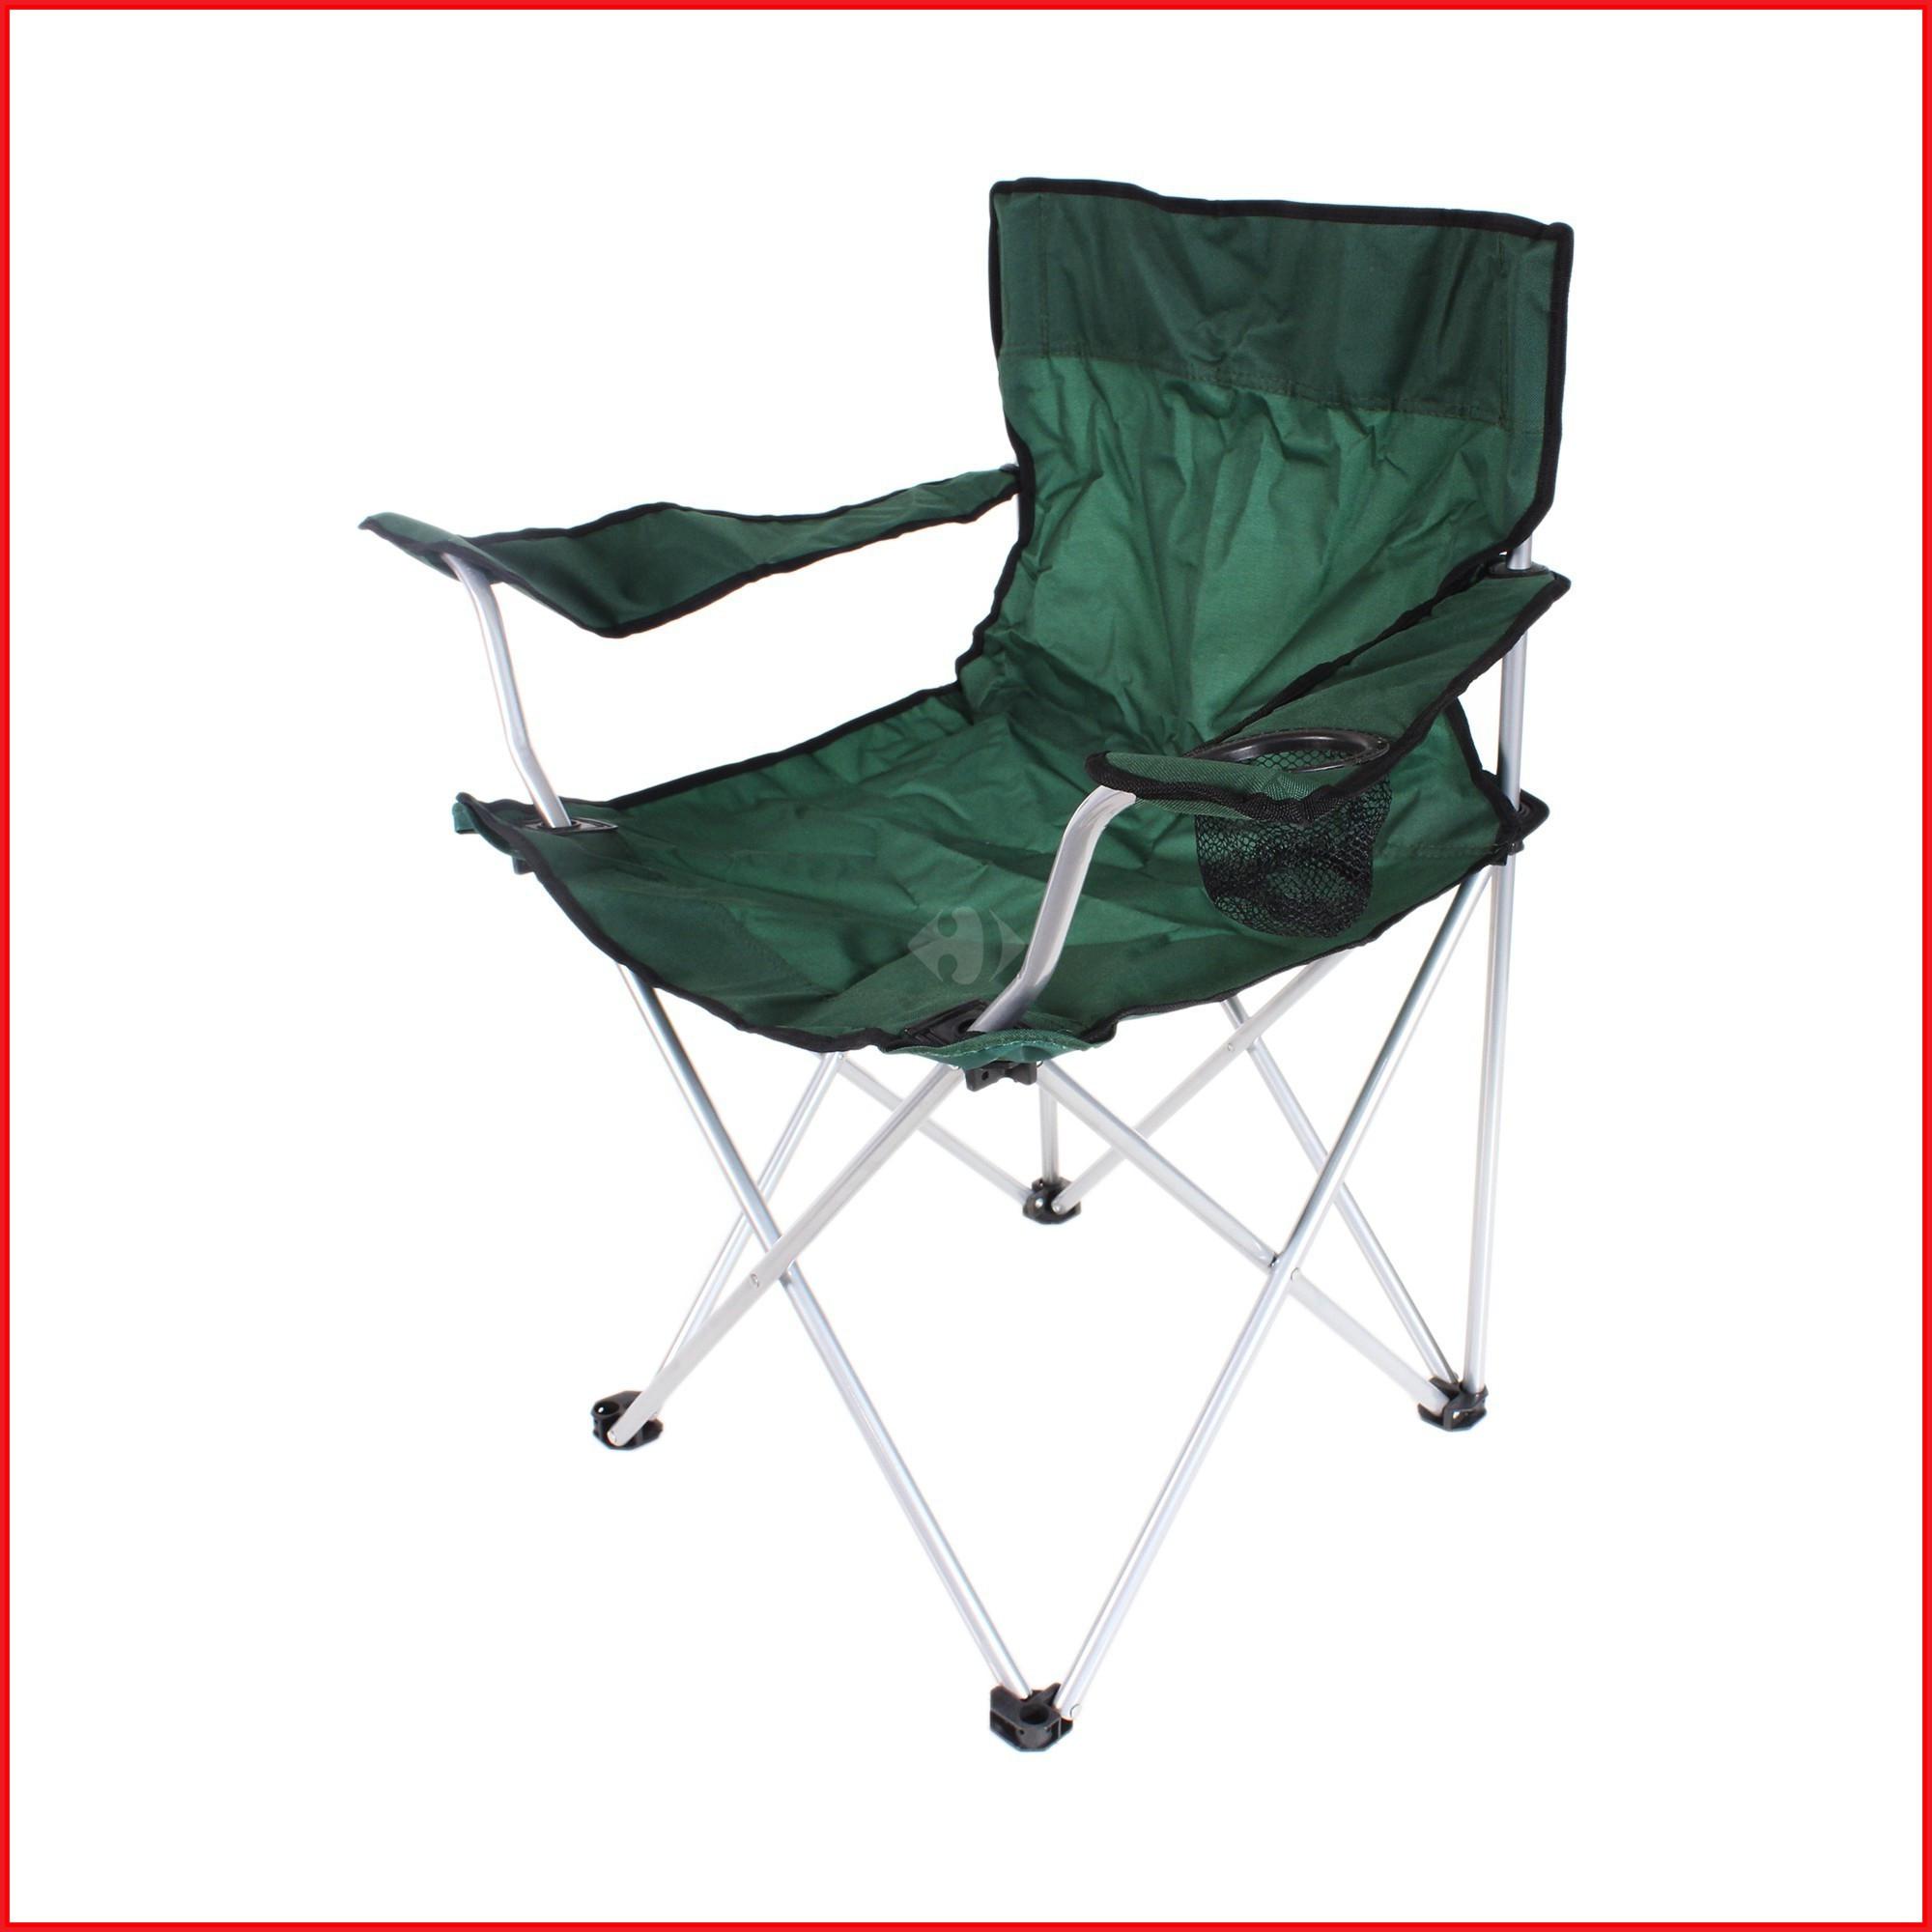 Sillas De Camping Baratas Zwd9 Sillas De Camping Baratas Encantador Sillas De Camping Baratas